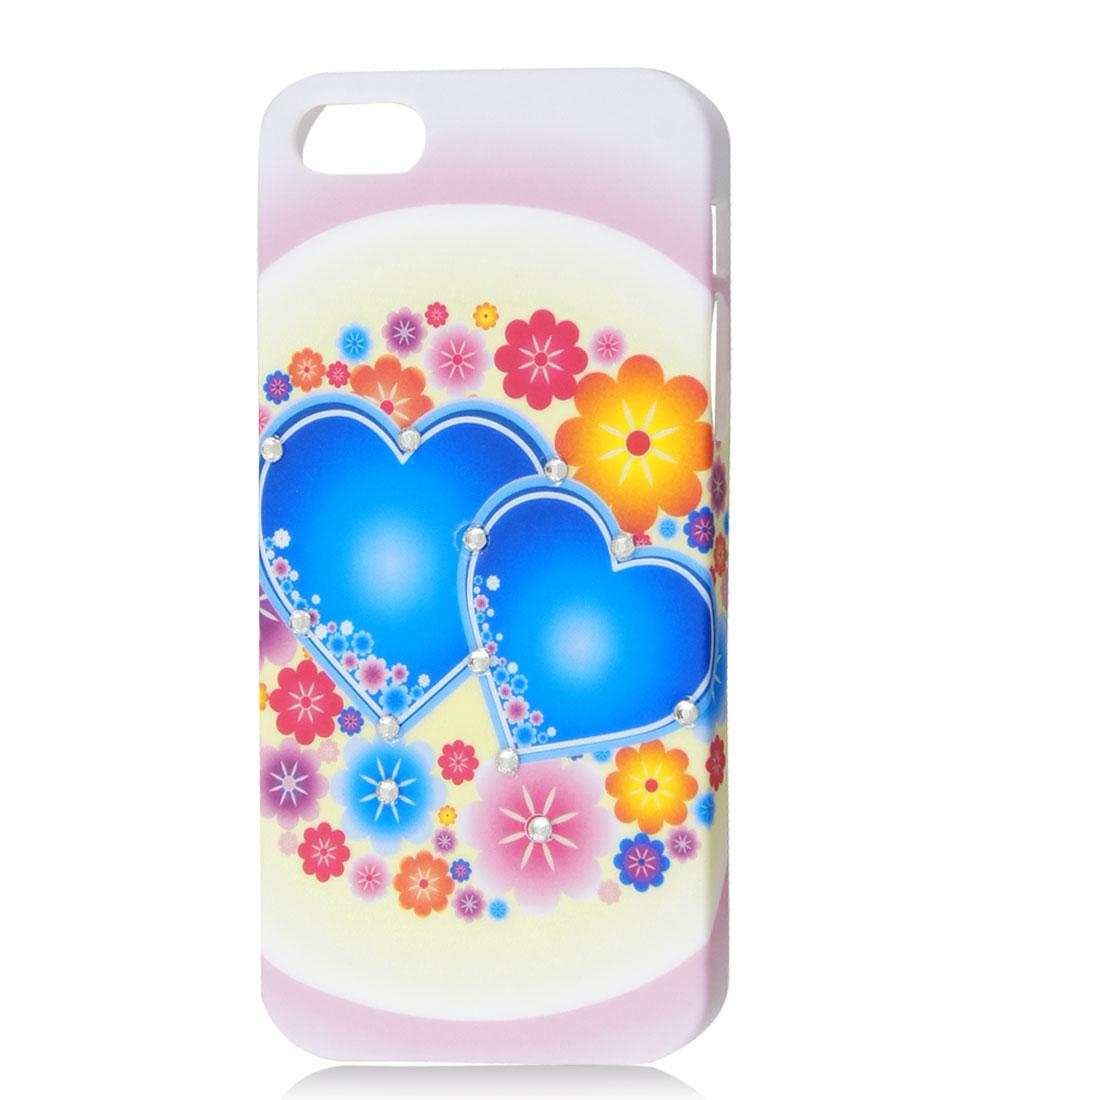 Blue Heart & Flower Bling Sparkle Rhinestone Hard Back Case Cover for iPhone 5 5G